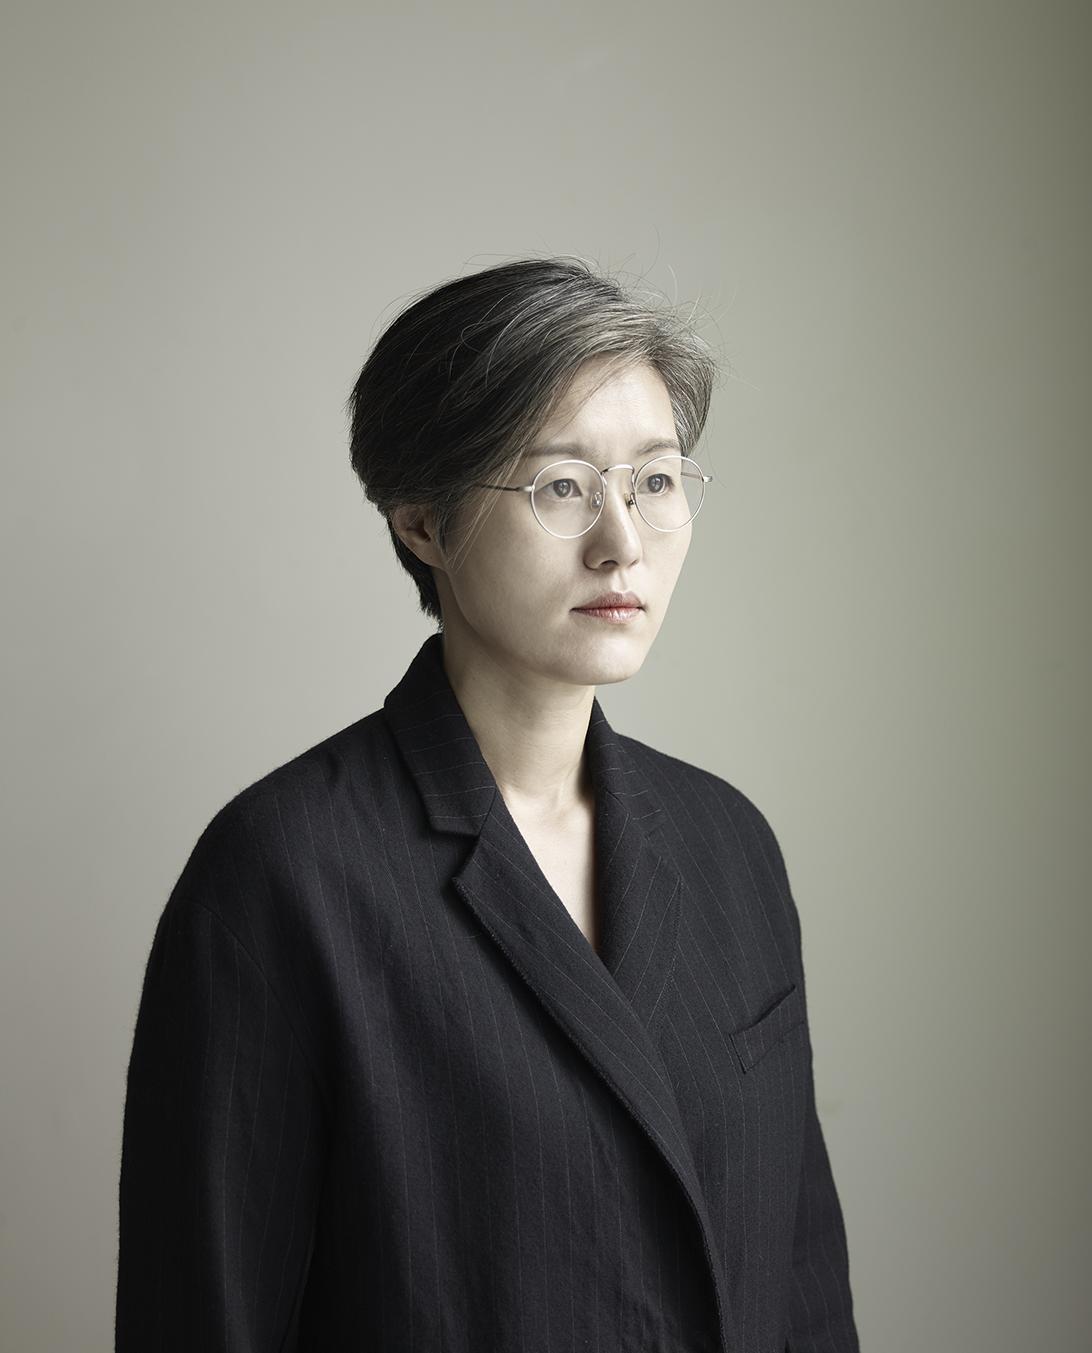 Artist's profile_Heeseung Chung_170.jpg